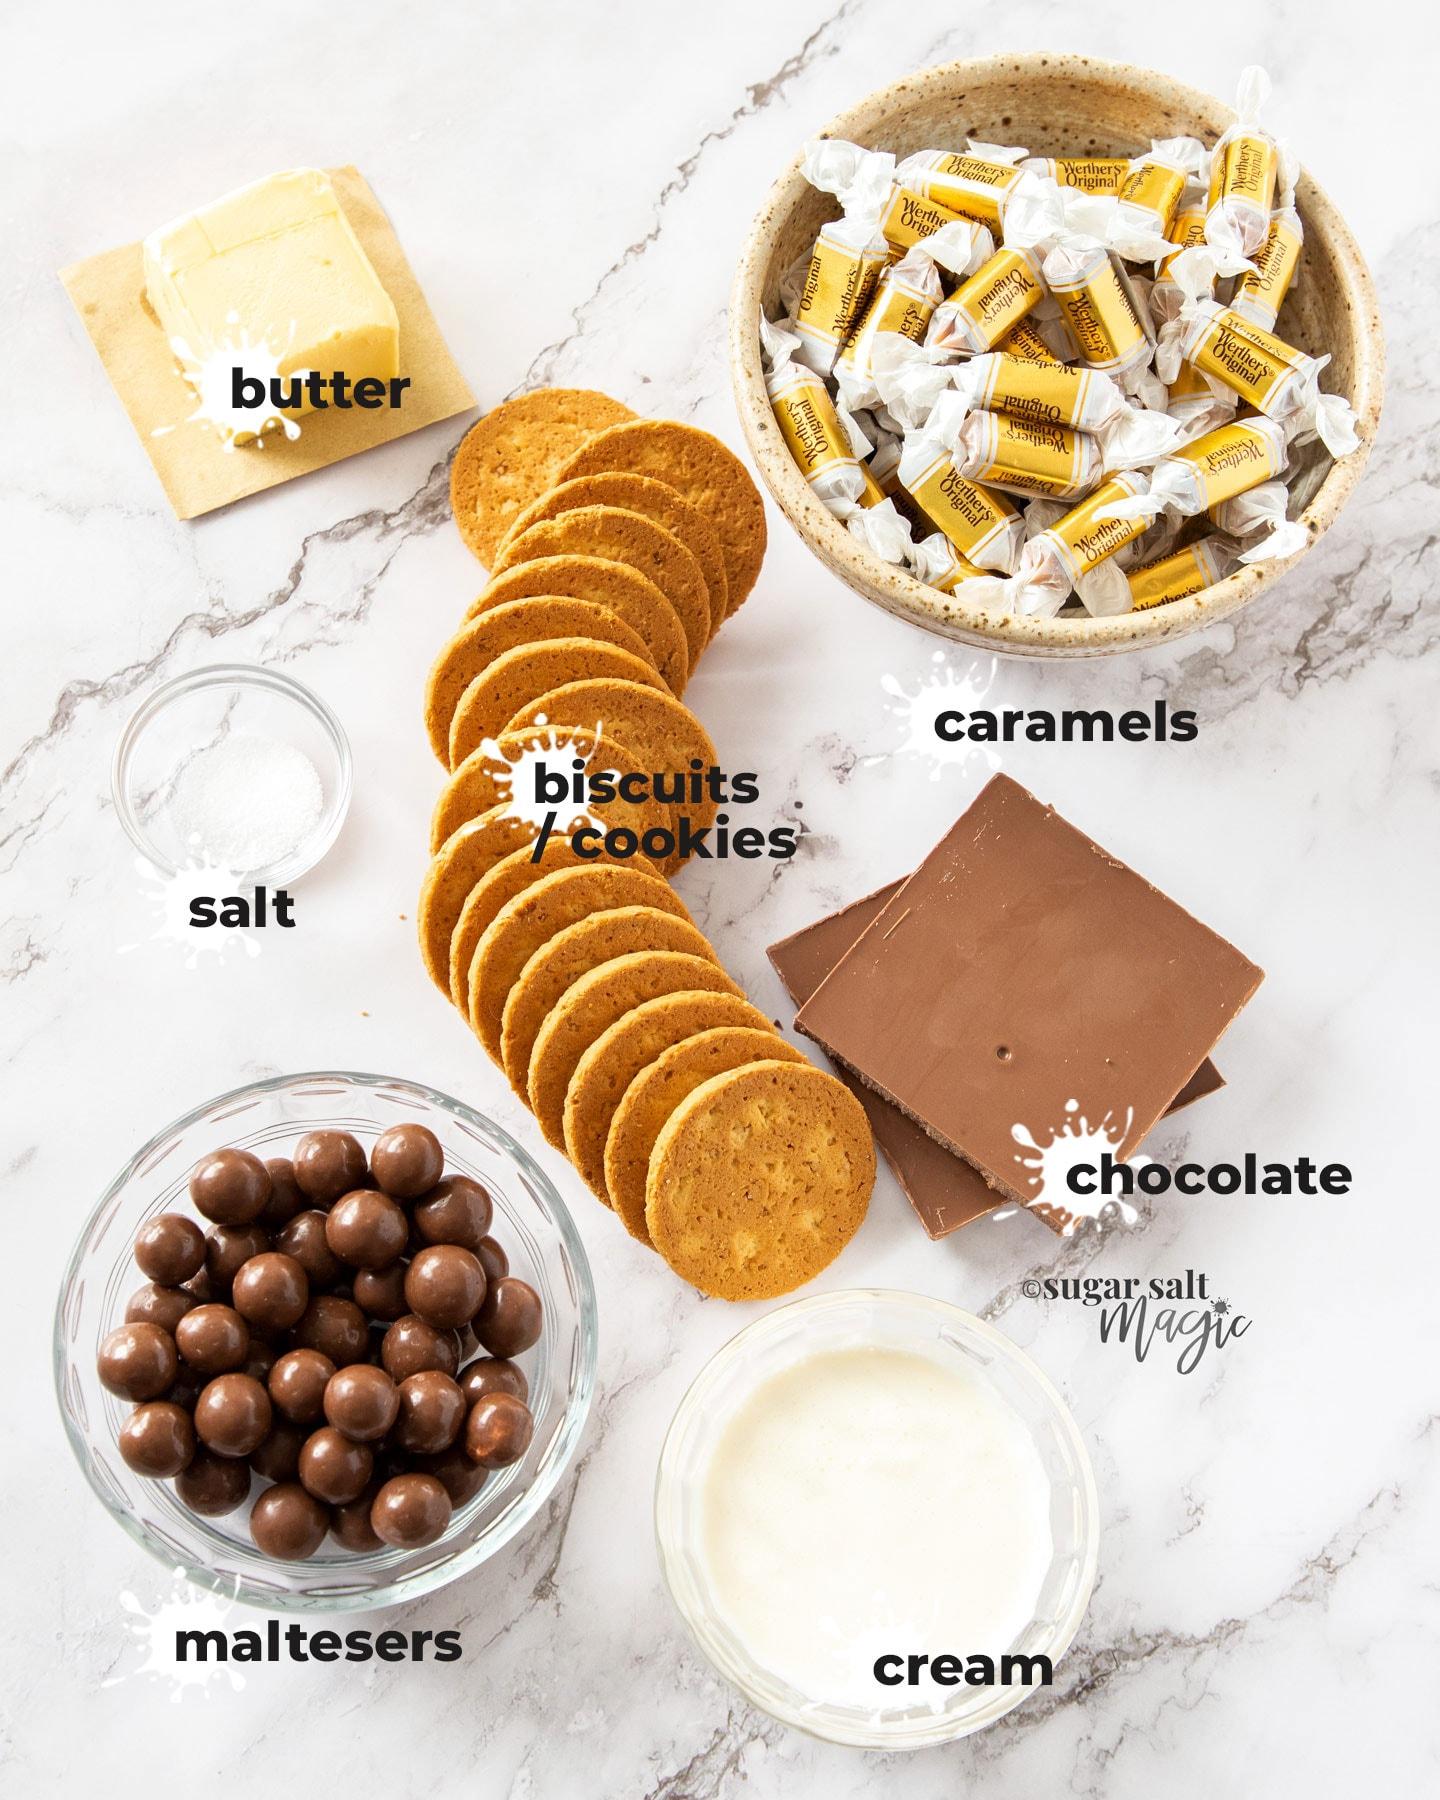 Ingredients for caramel malteser slice on a marble benchtop.